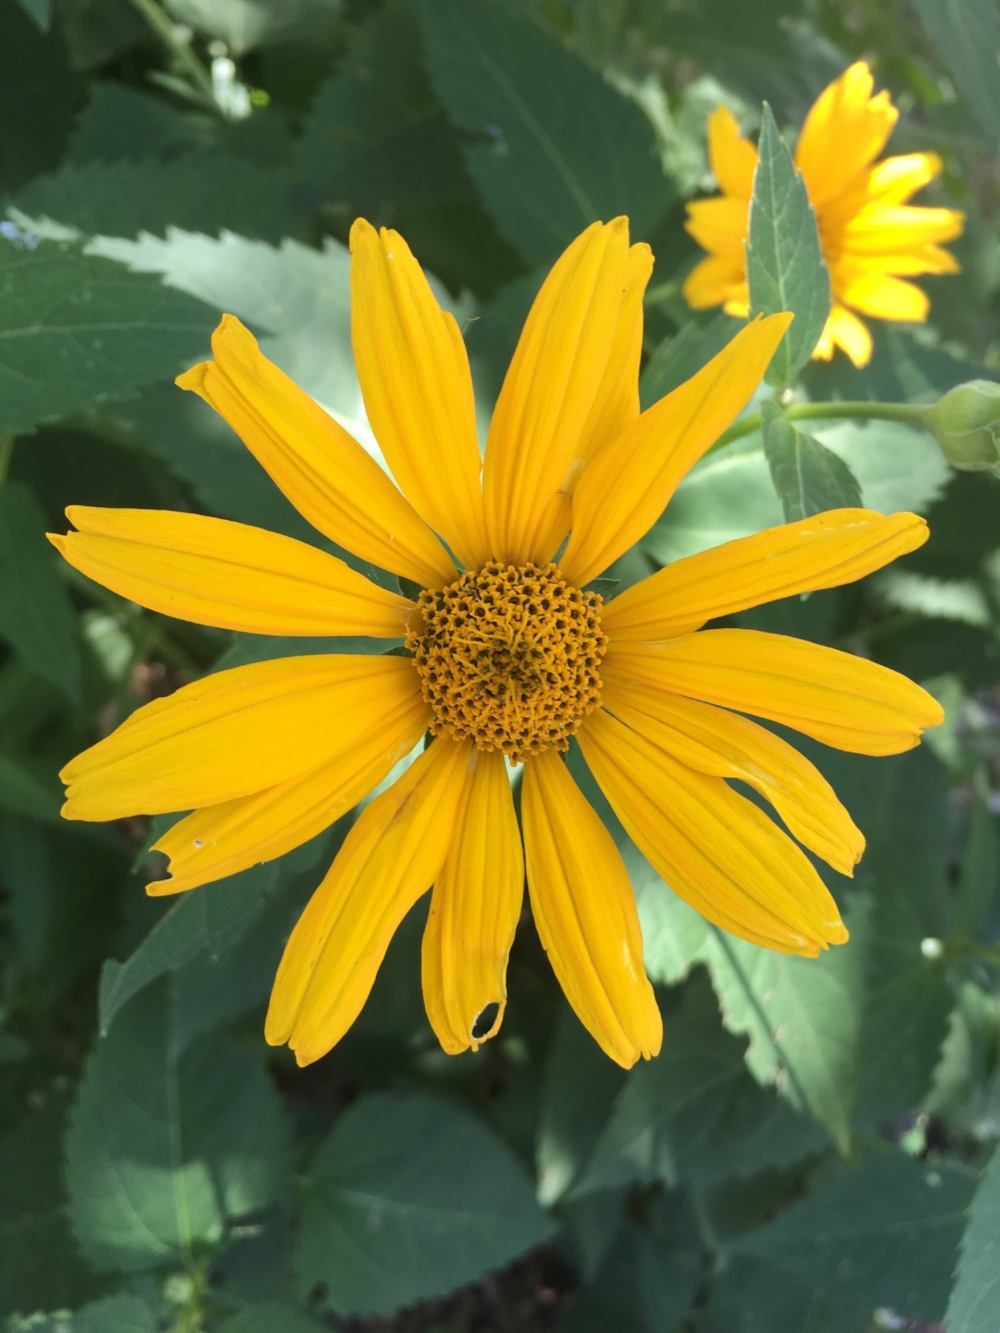 Woodland sunflower.jpg